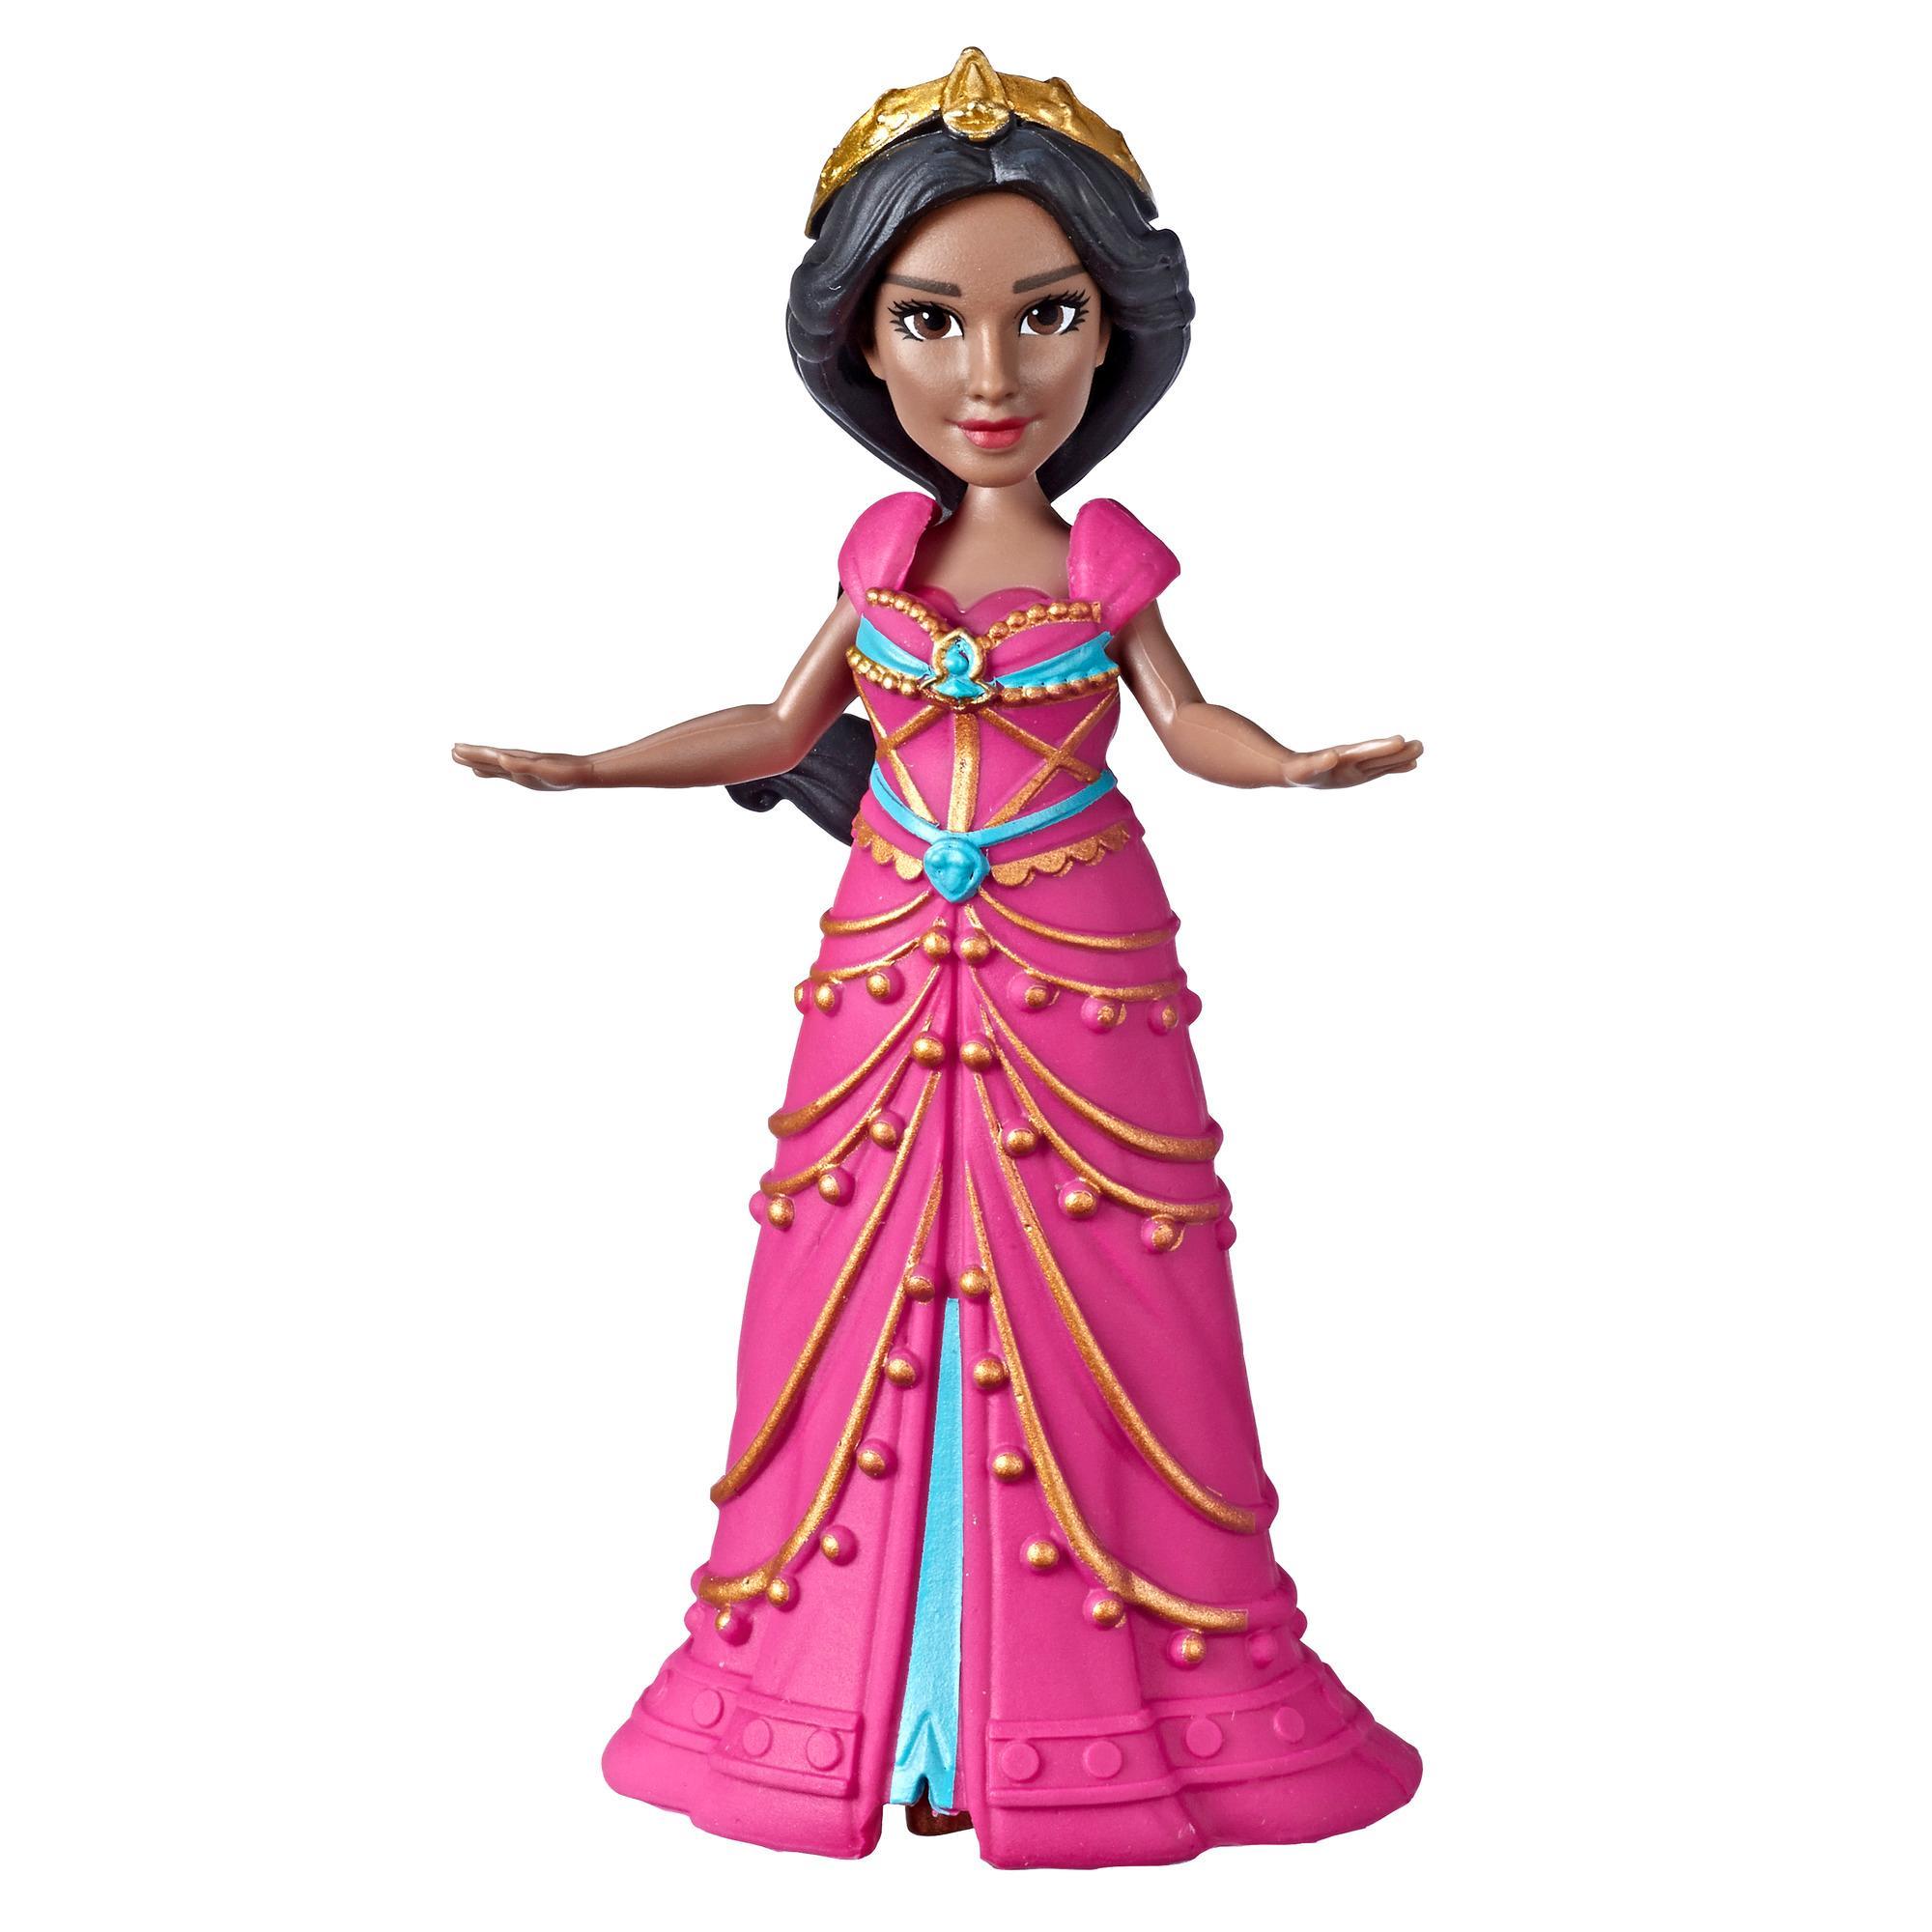 Disney Aladdin Mini Film Figür - Prenses Yasemin (Pembe Giysili)